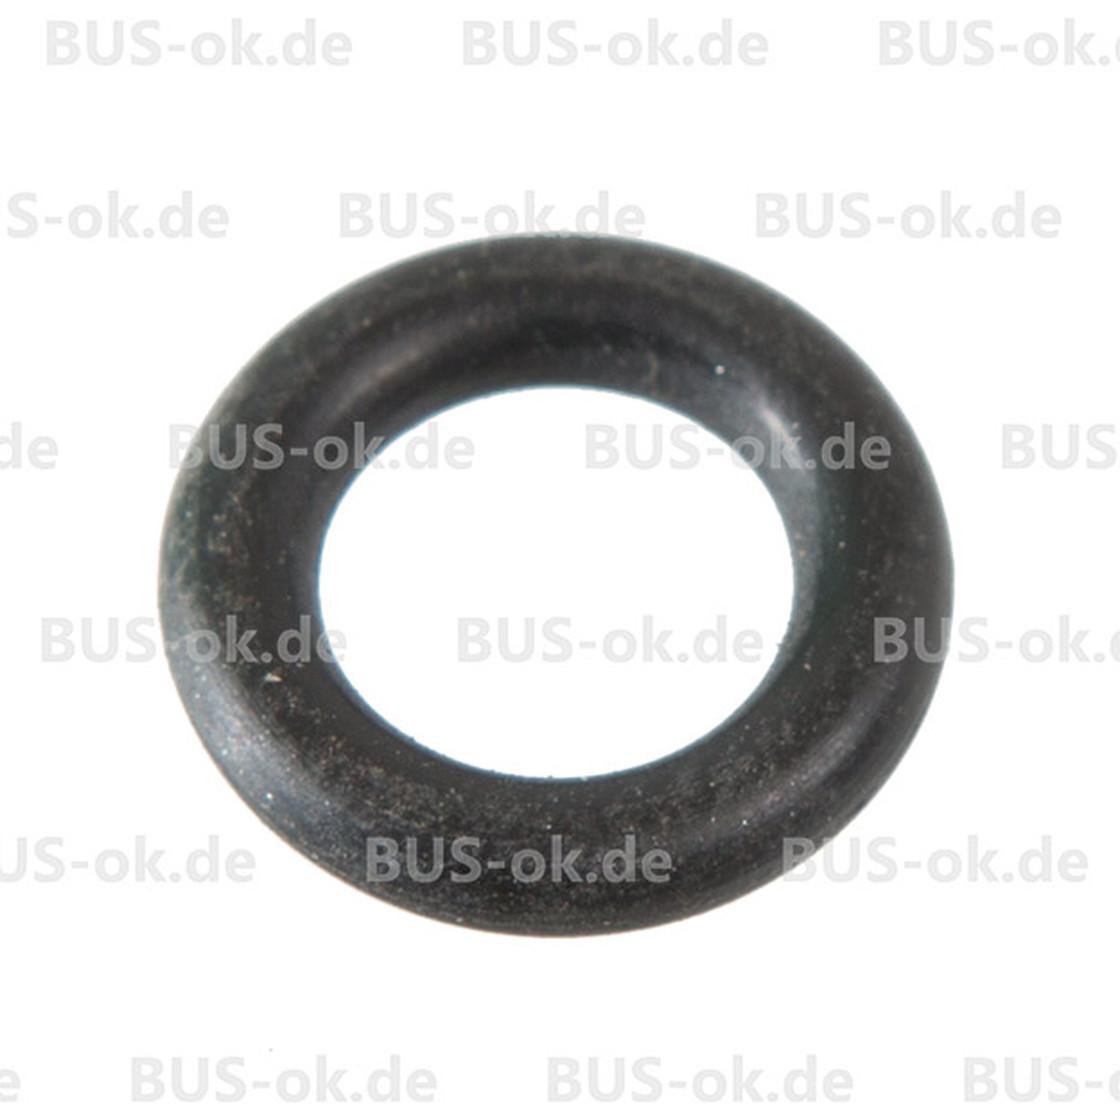 Type Split Bay Rocker Shaft Stud O Ring Seal Orig Vw Oem Partnr B on Vw Bus Engine Bay